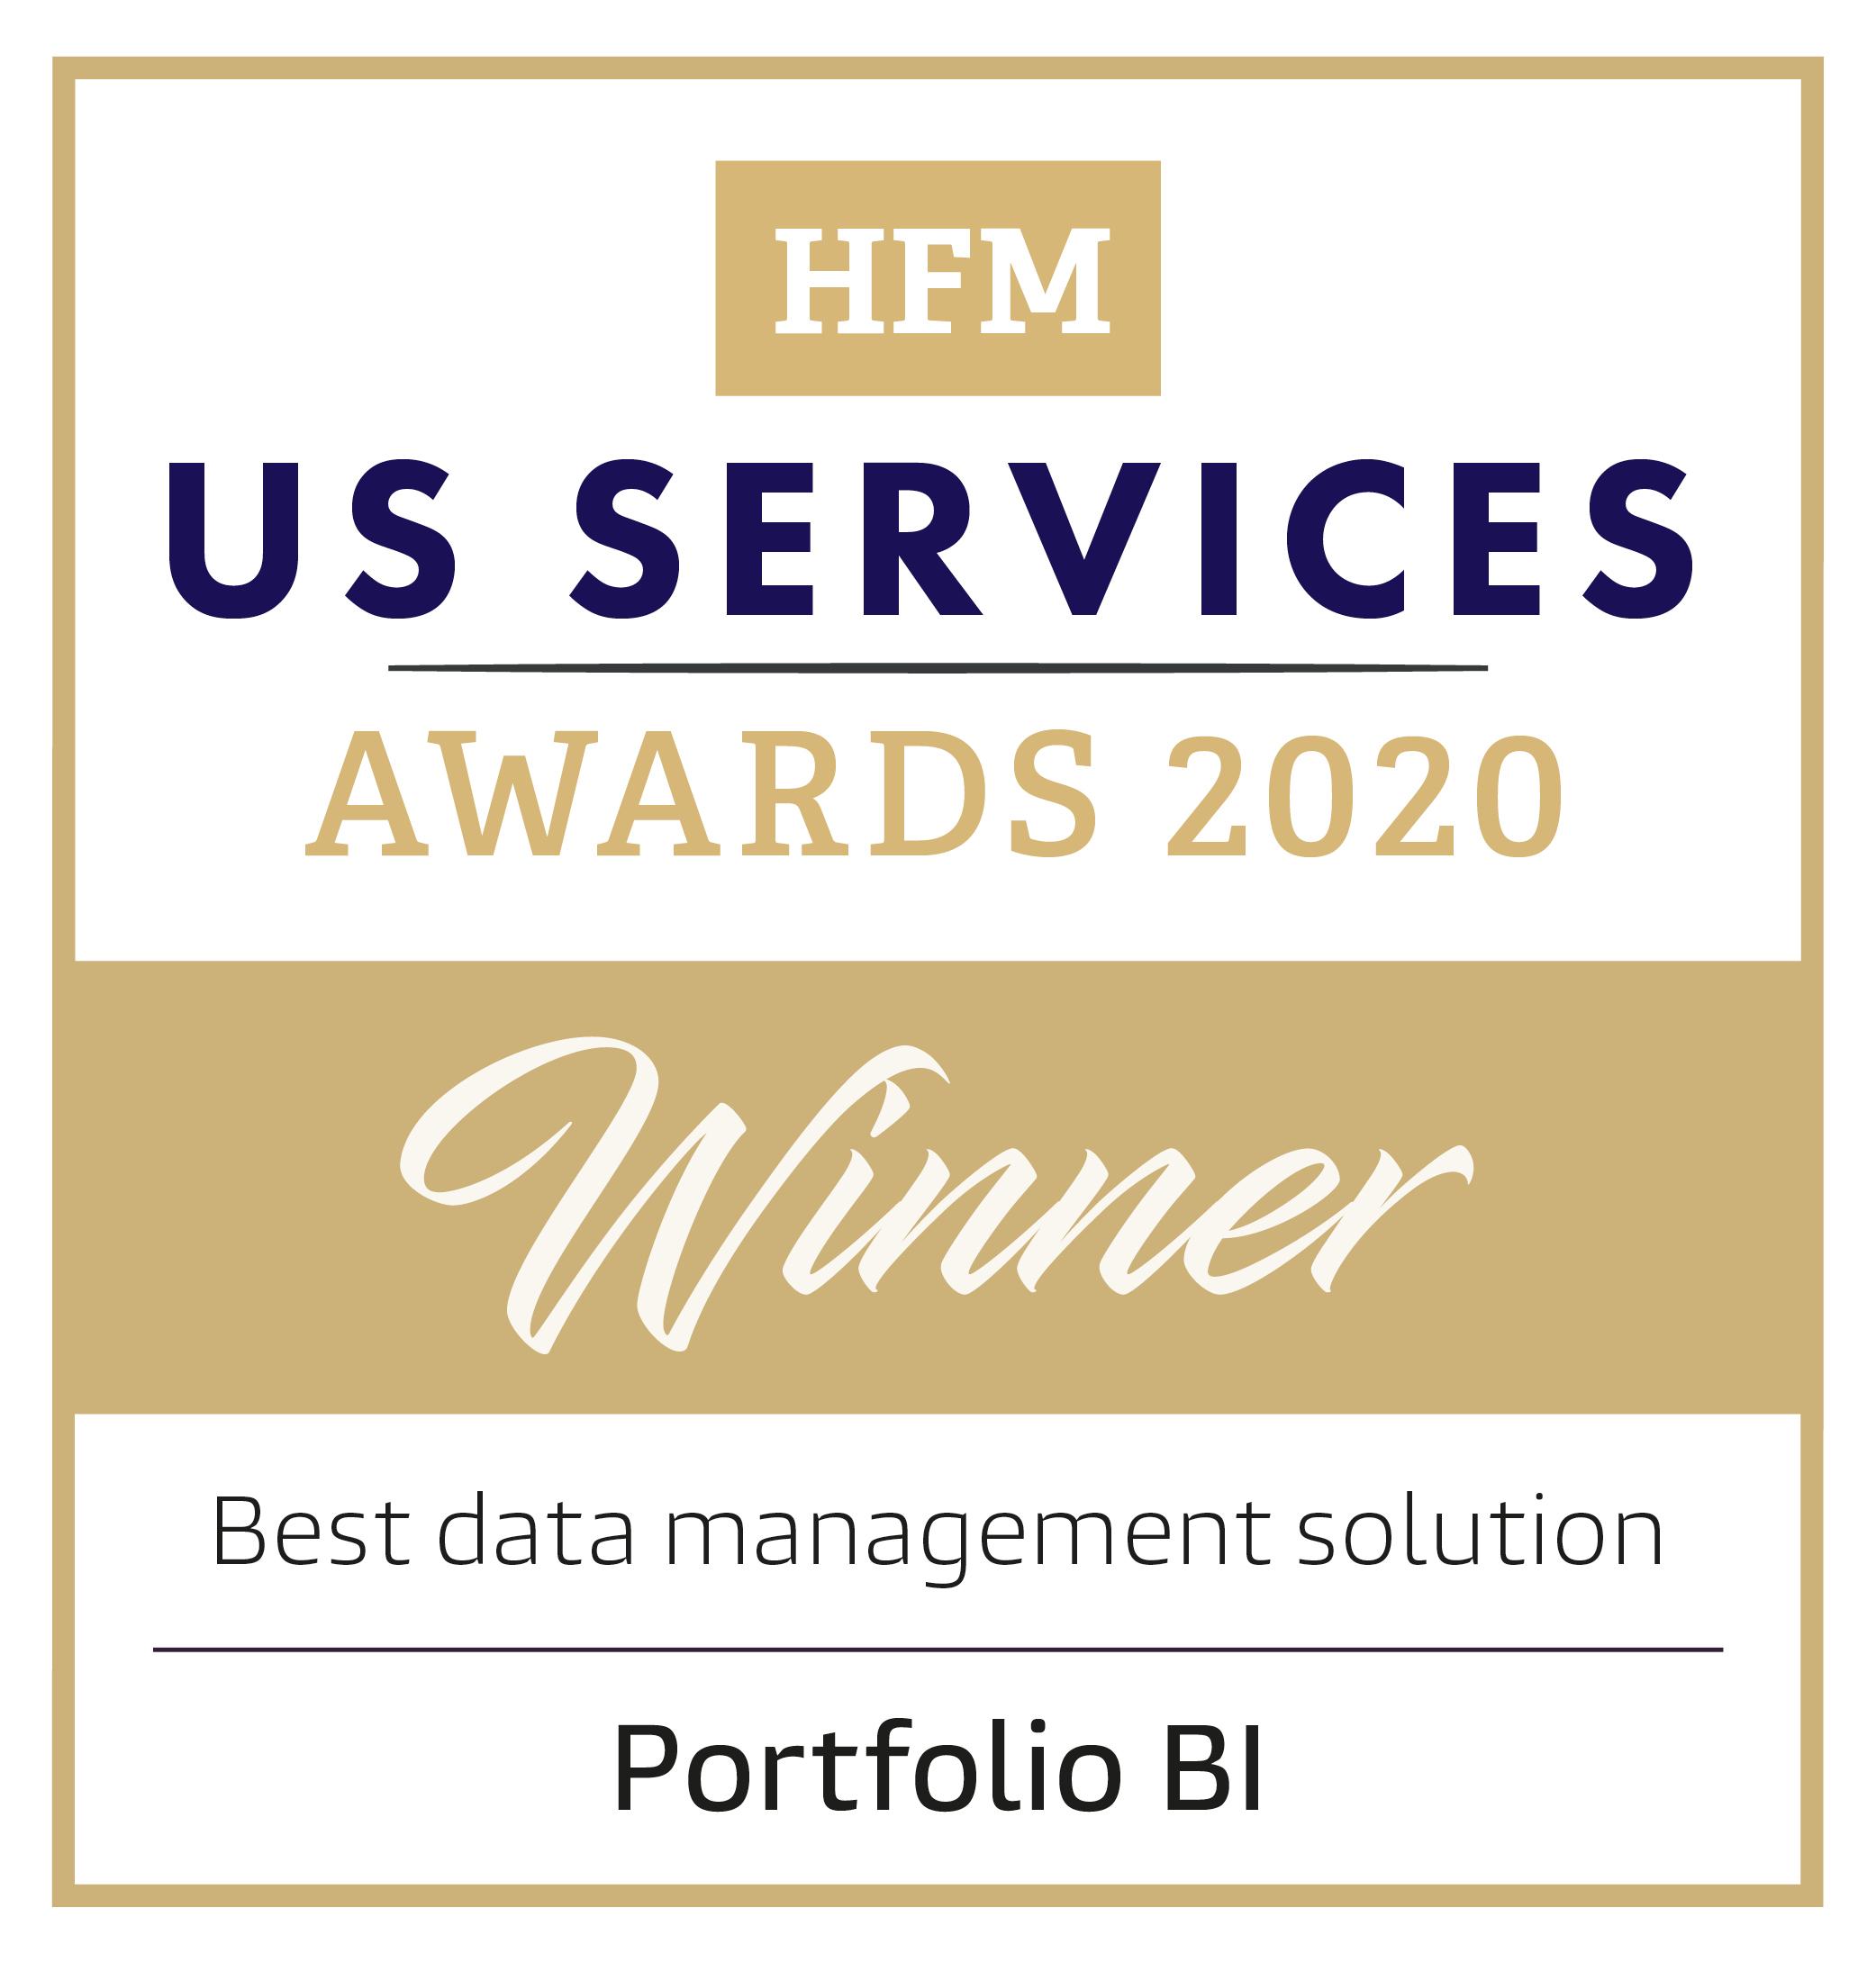 HFM US Services Awards 2020 Winner - Best Data Management Solution - Portfolio BI